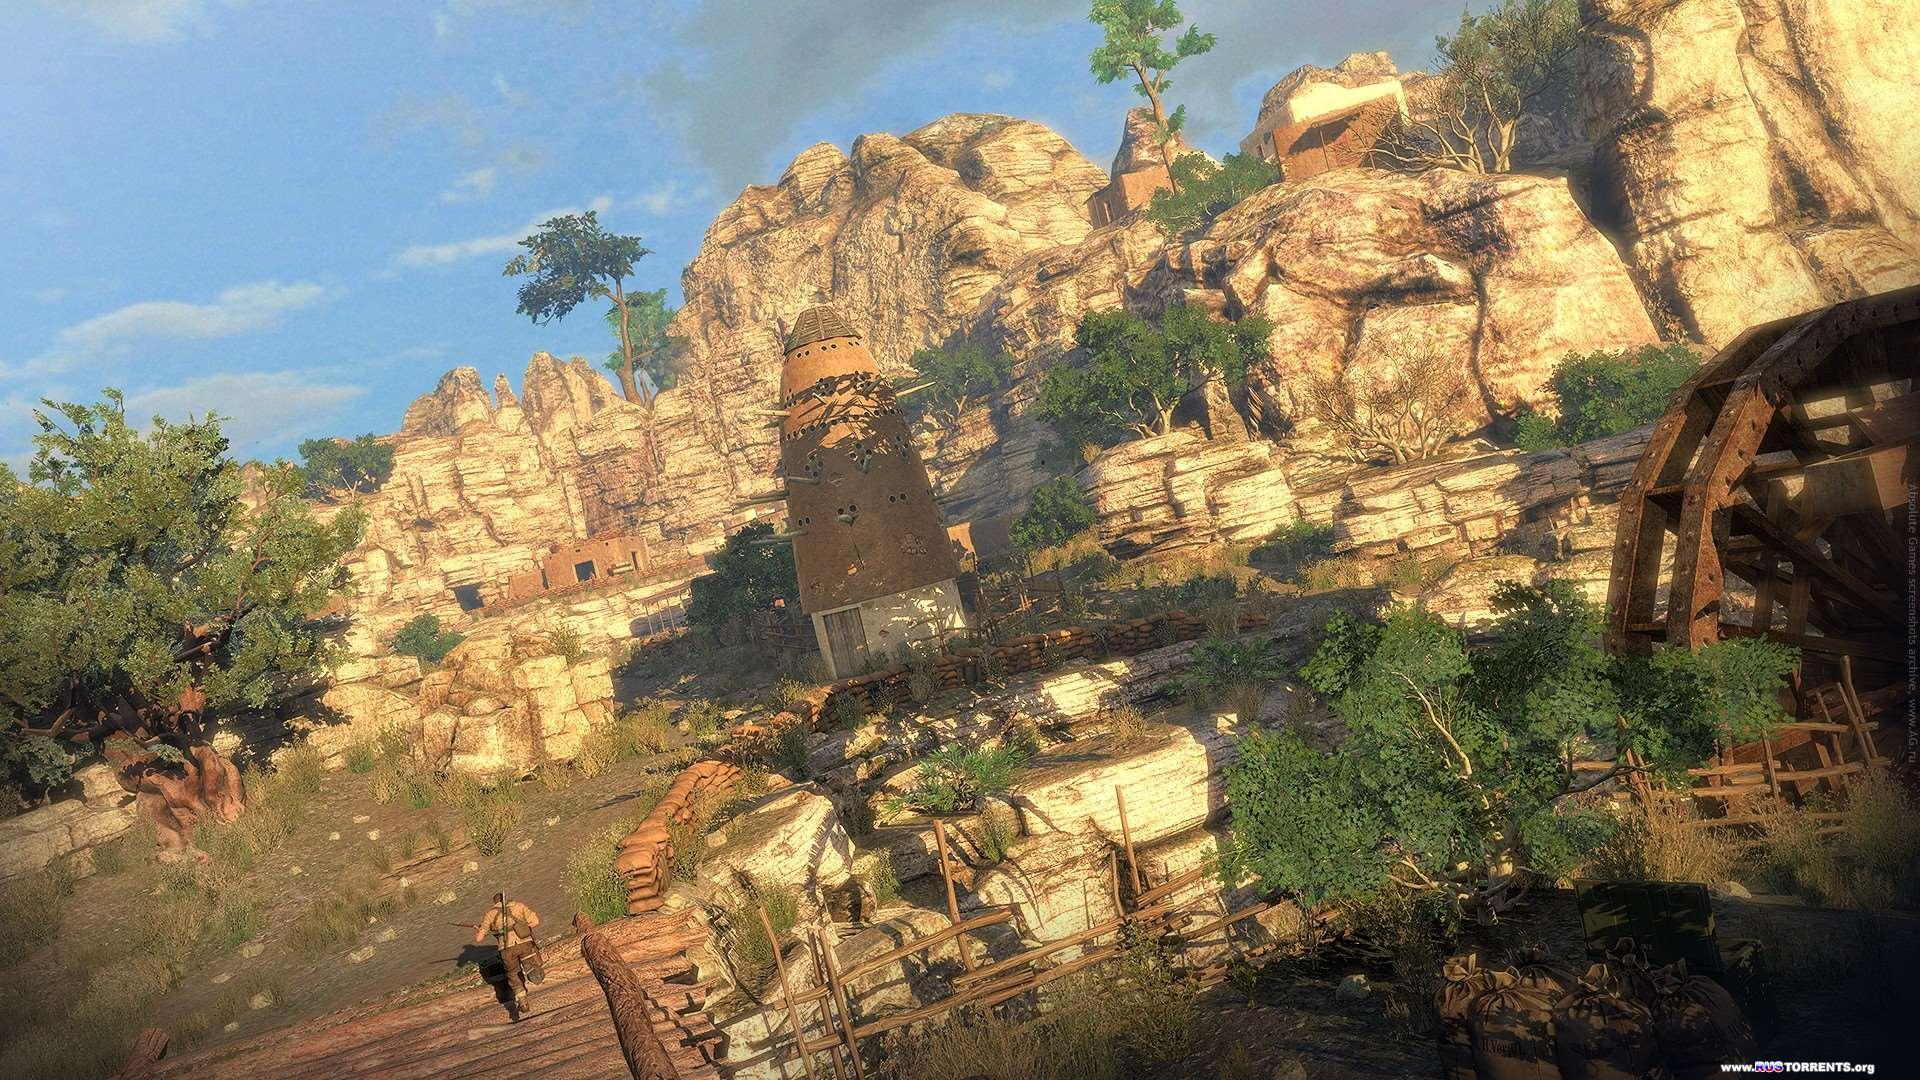 Sniper Elite III [v 1.08 + 10 DLC] | PC | RePack �� R.G. Games